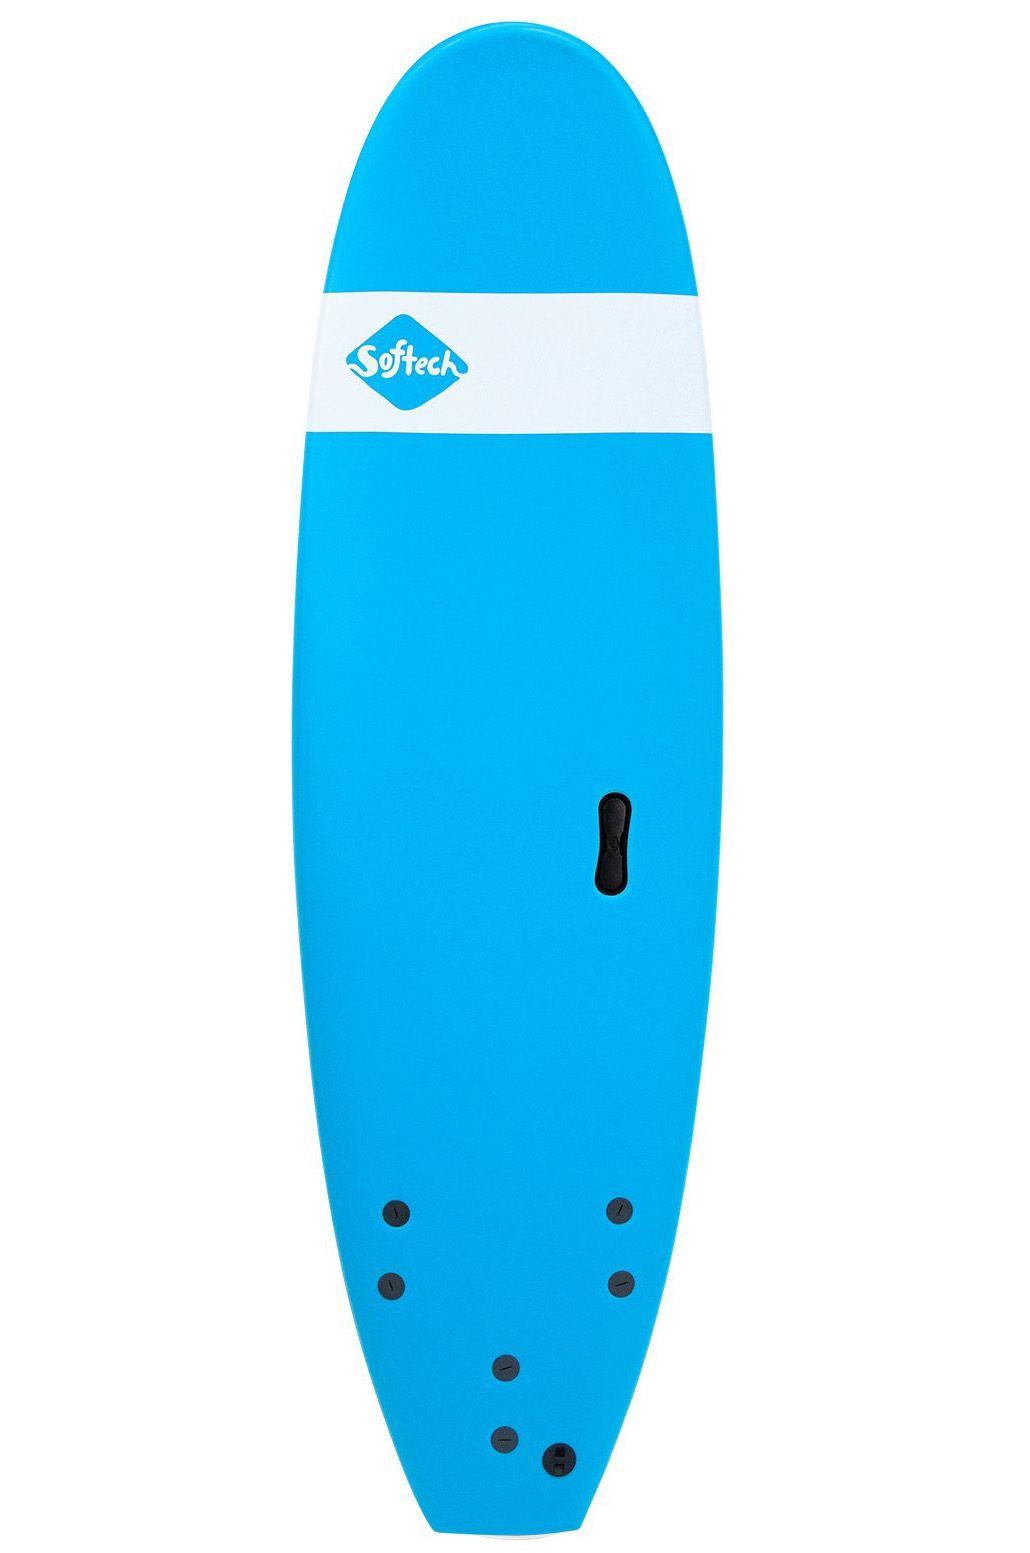 Prancha Surf Softech 7'6 ROLLER BLUE Square Tail - Color FCS 7ft6